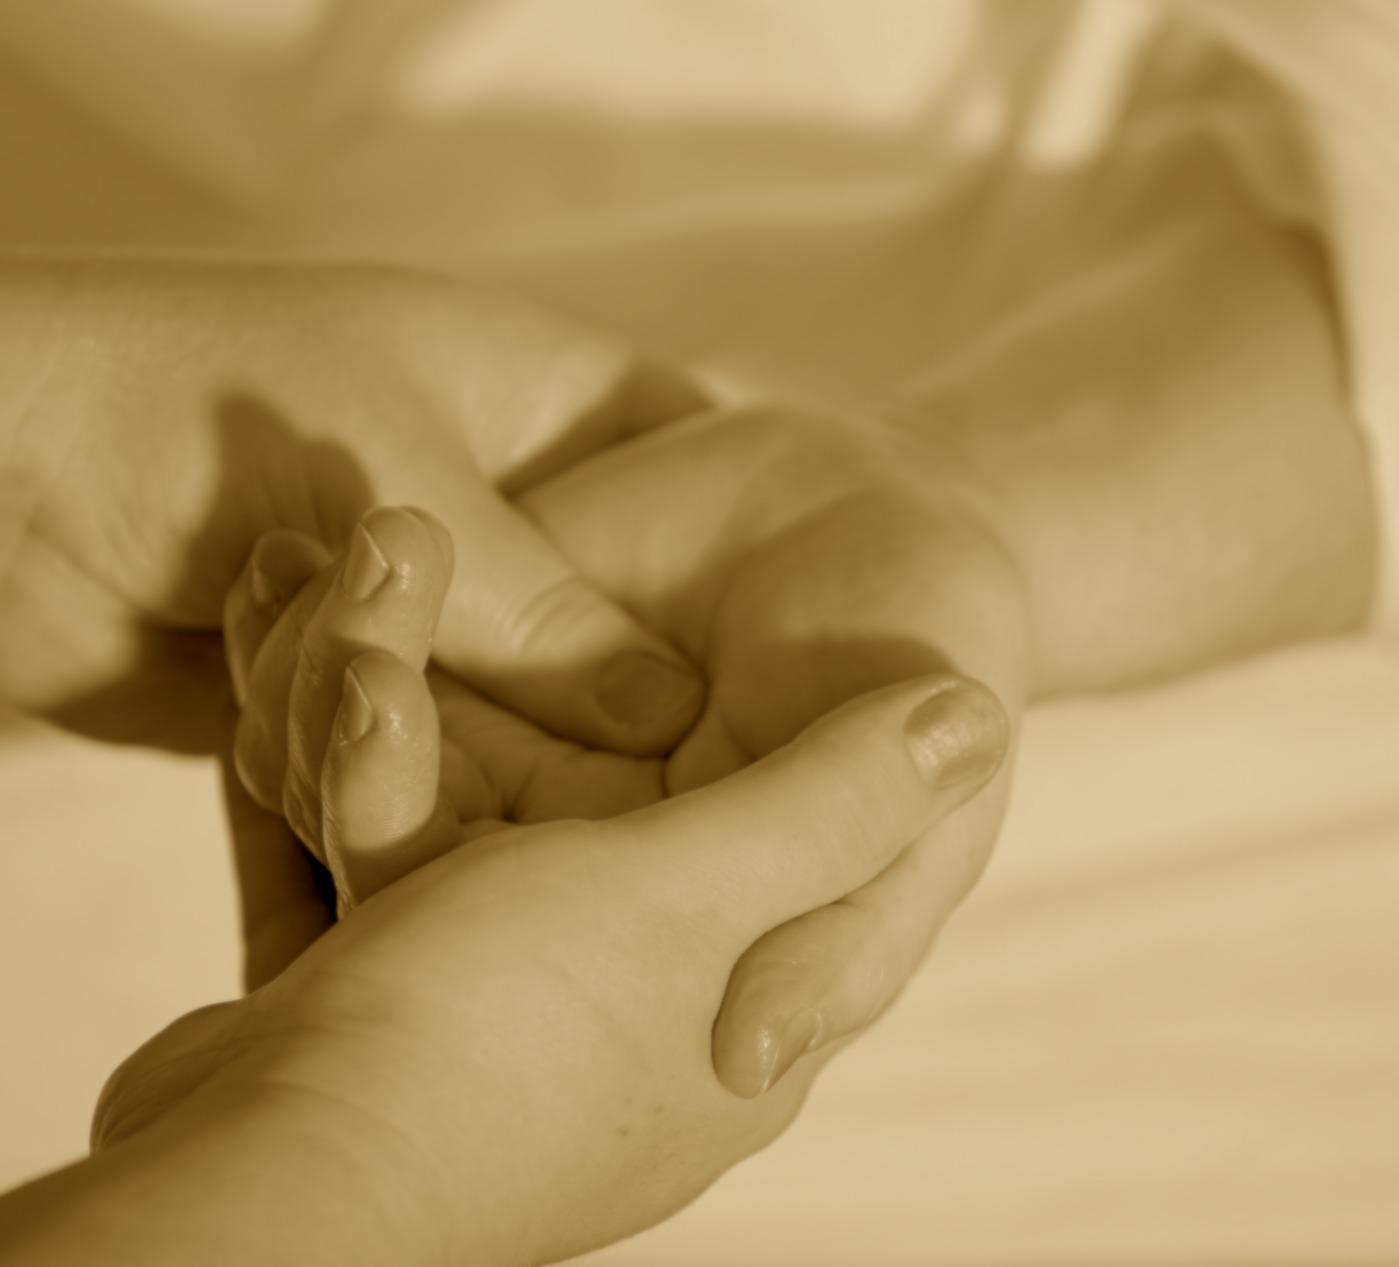 hand massage resized.jpg